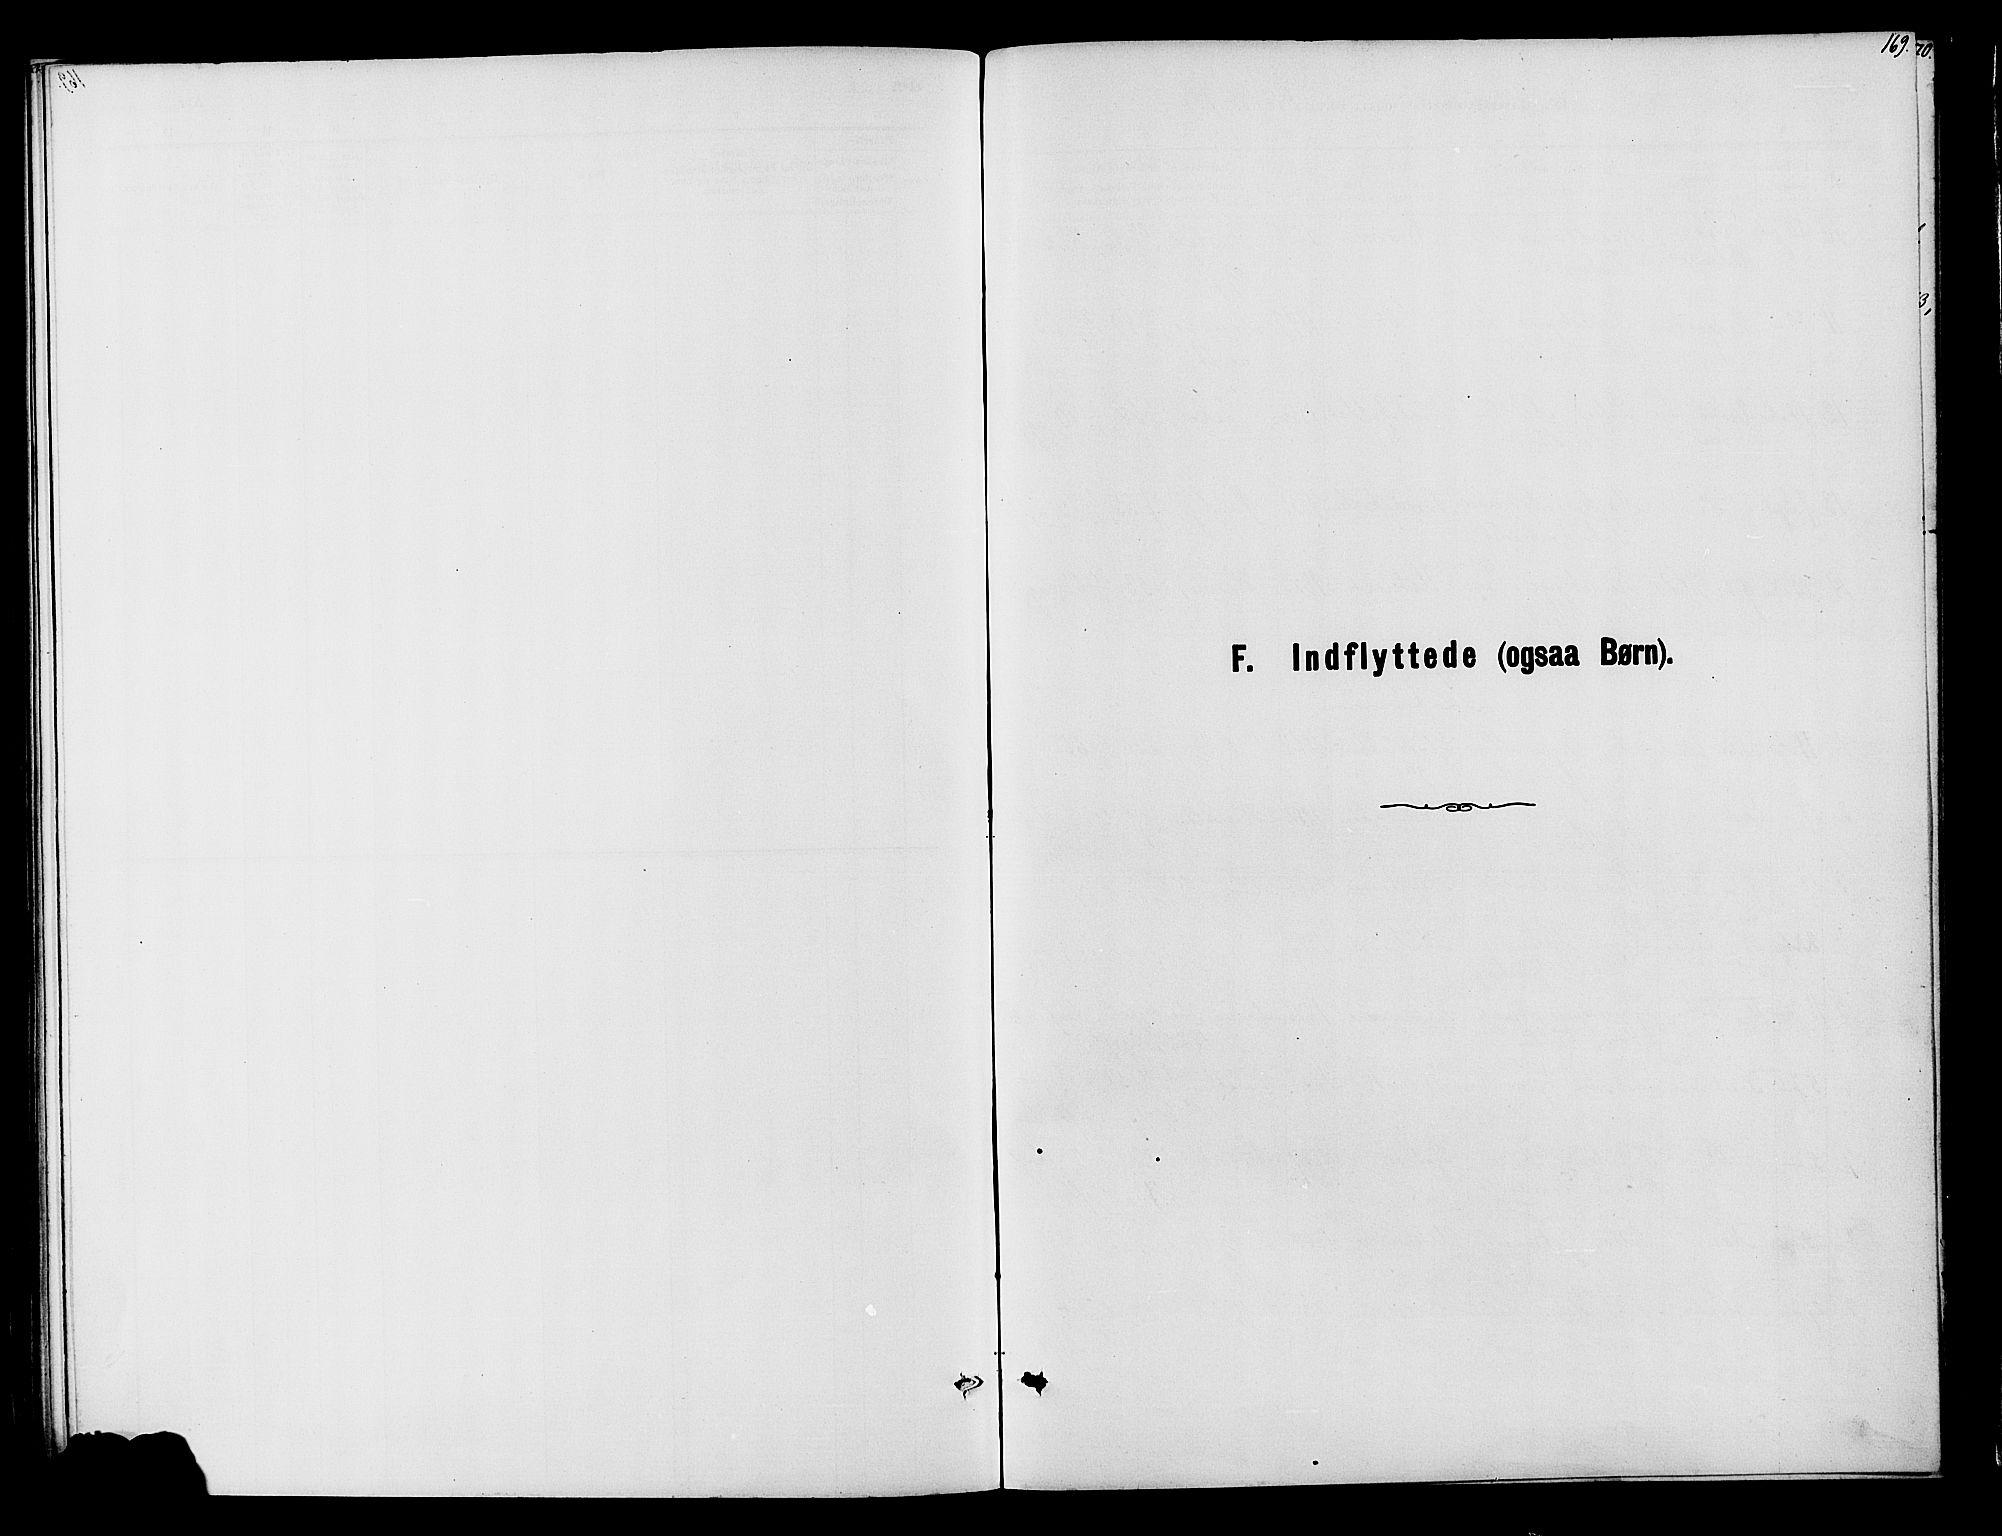 SAH, Vardal prestekontor, H/Ha/Haa/L0010: Ministerialbok nr. 10, 1878-1893, s. 169